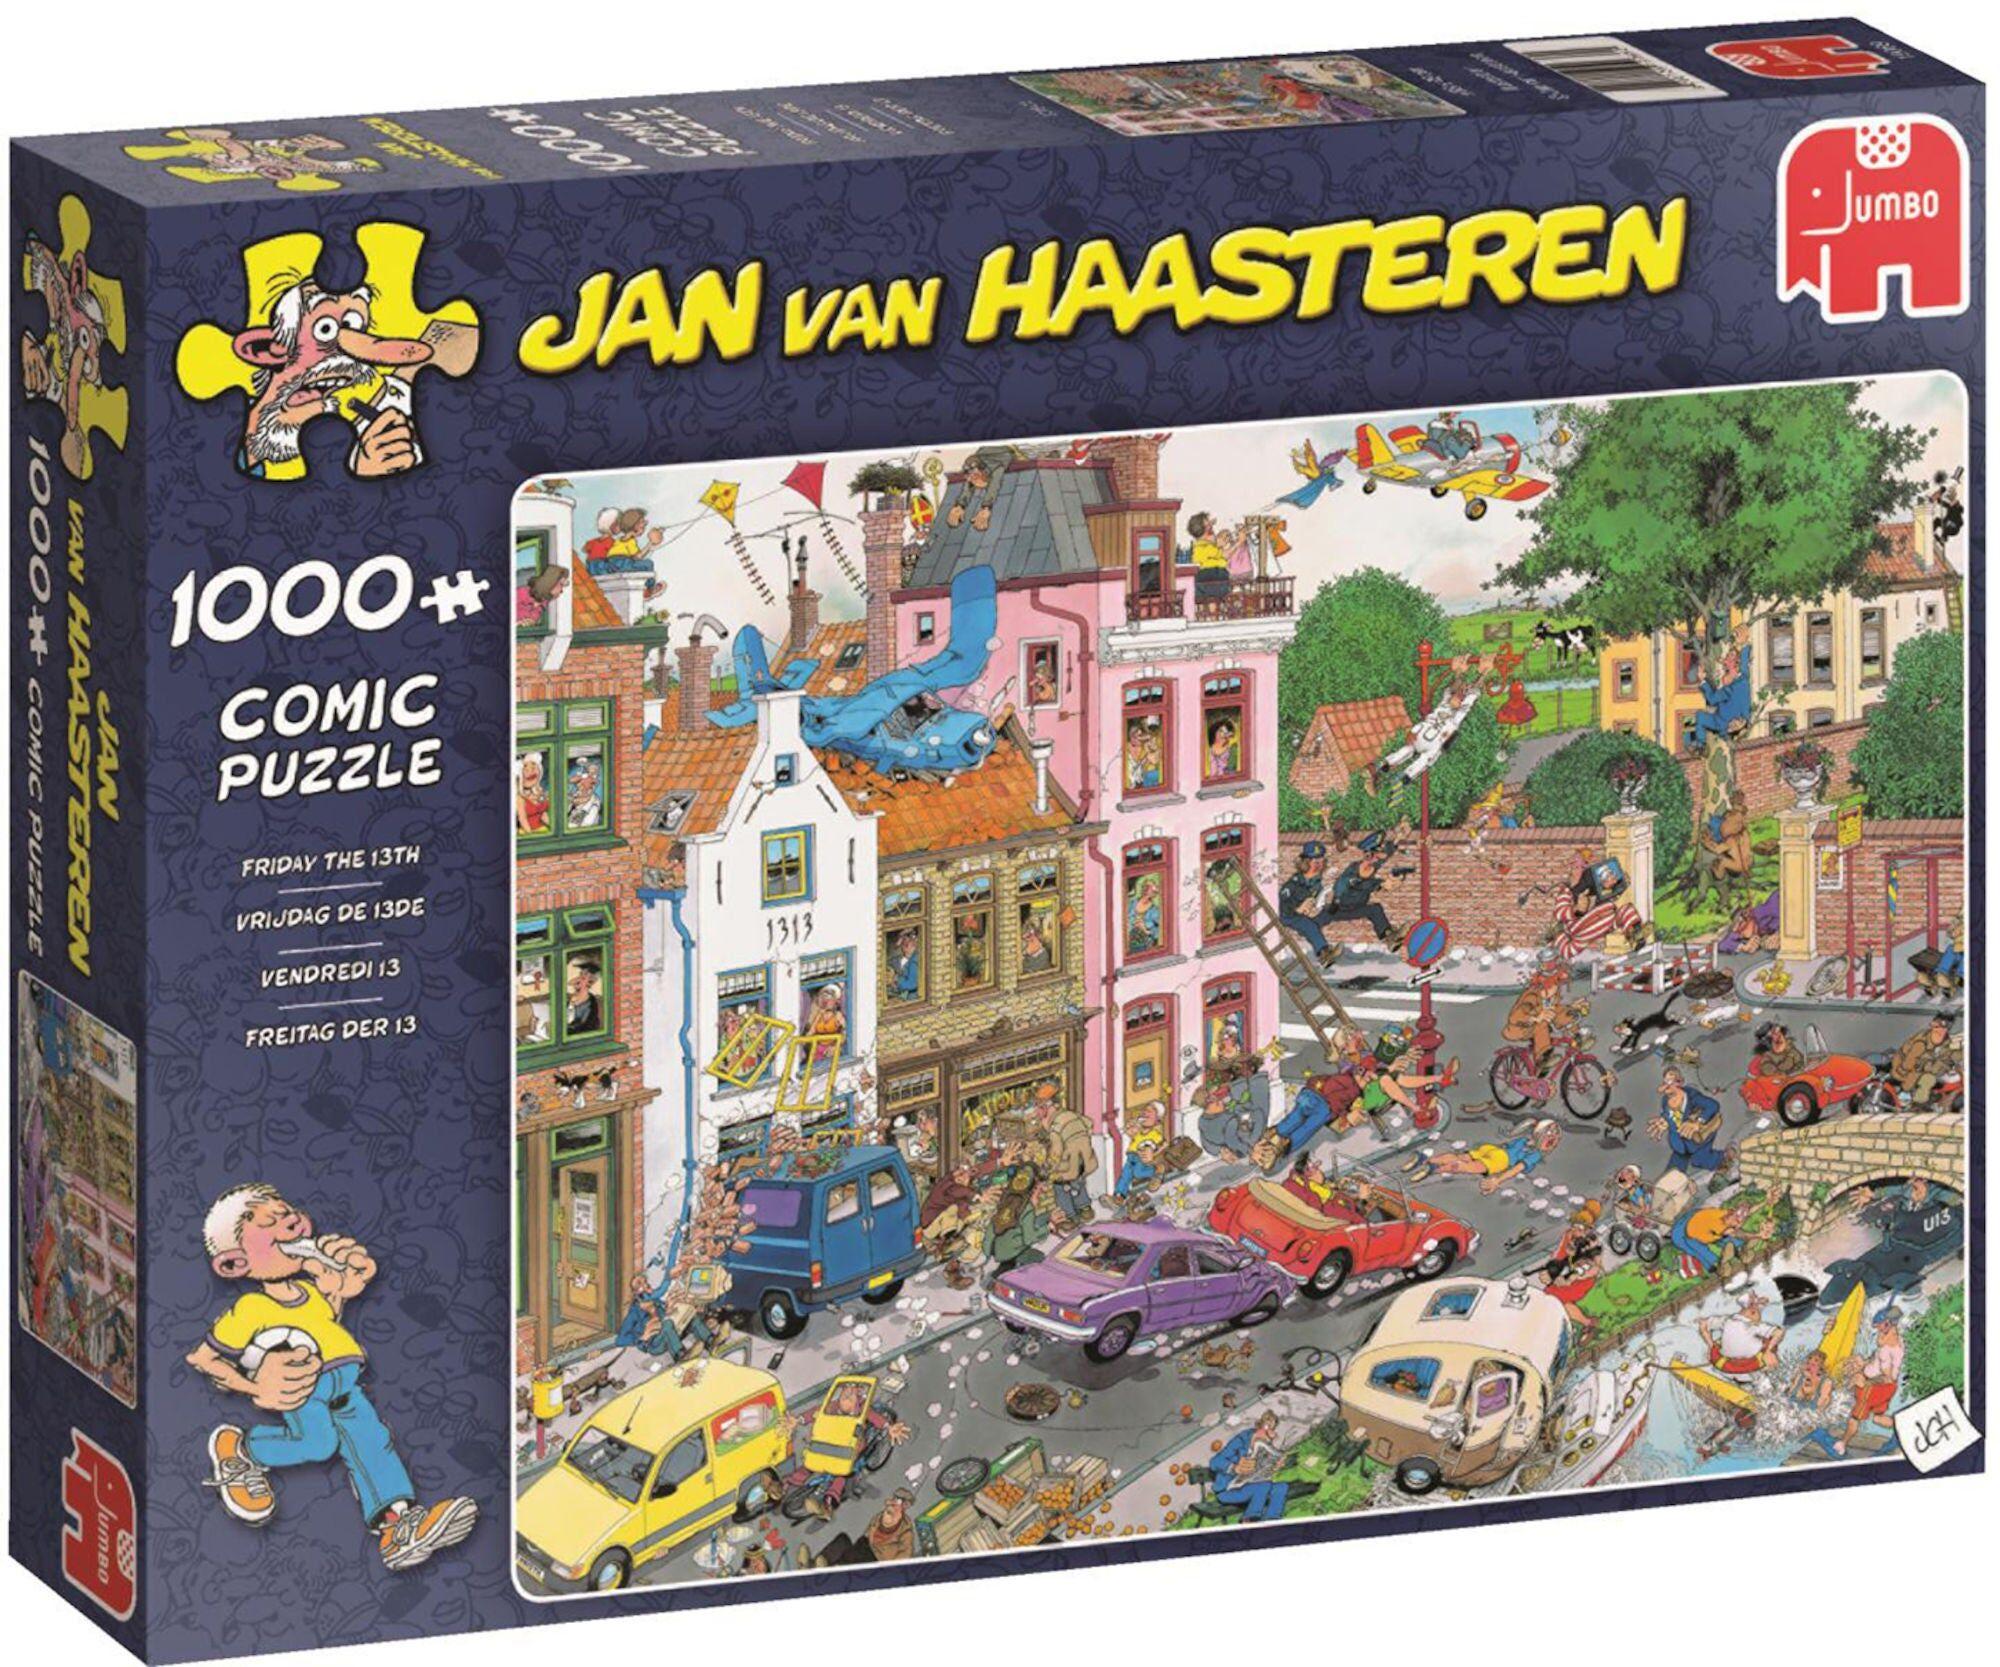 Jumbo Puslespill Jan van Haasteren Friday The 13TH 1000